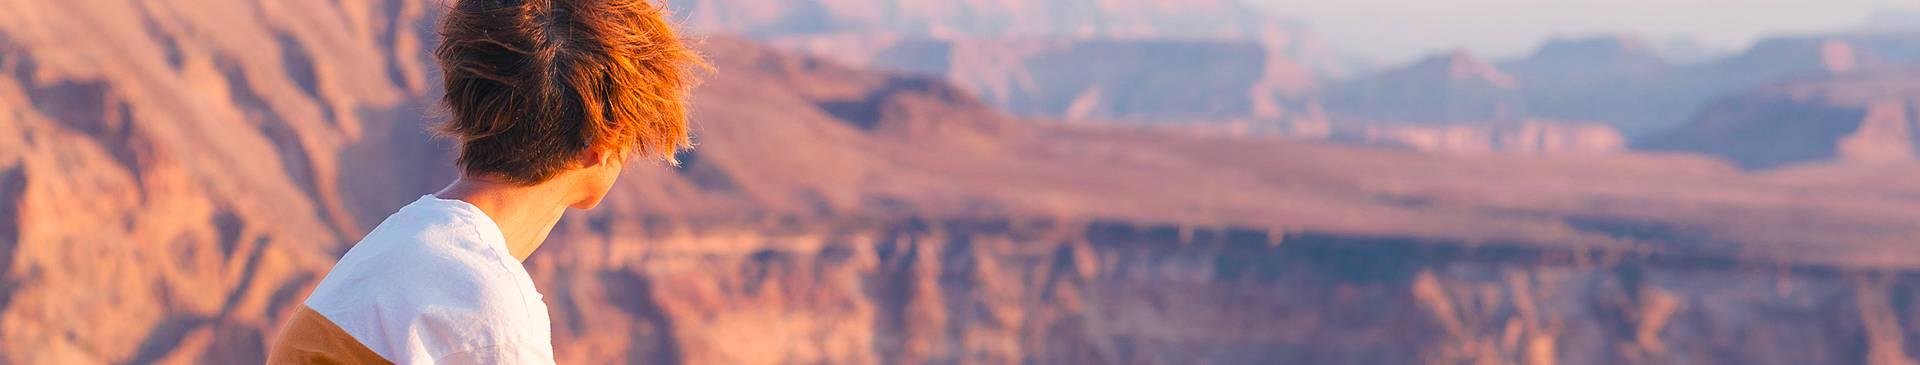 Bergurlaub Namibia